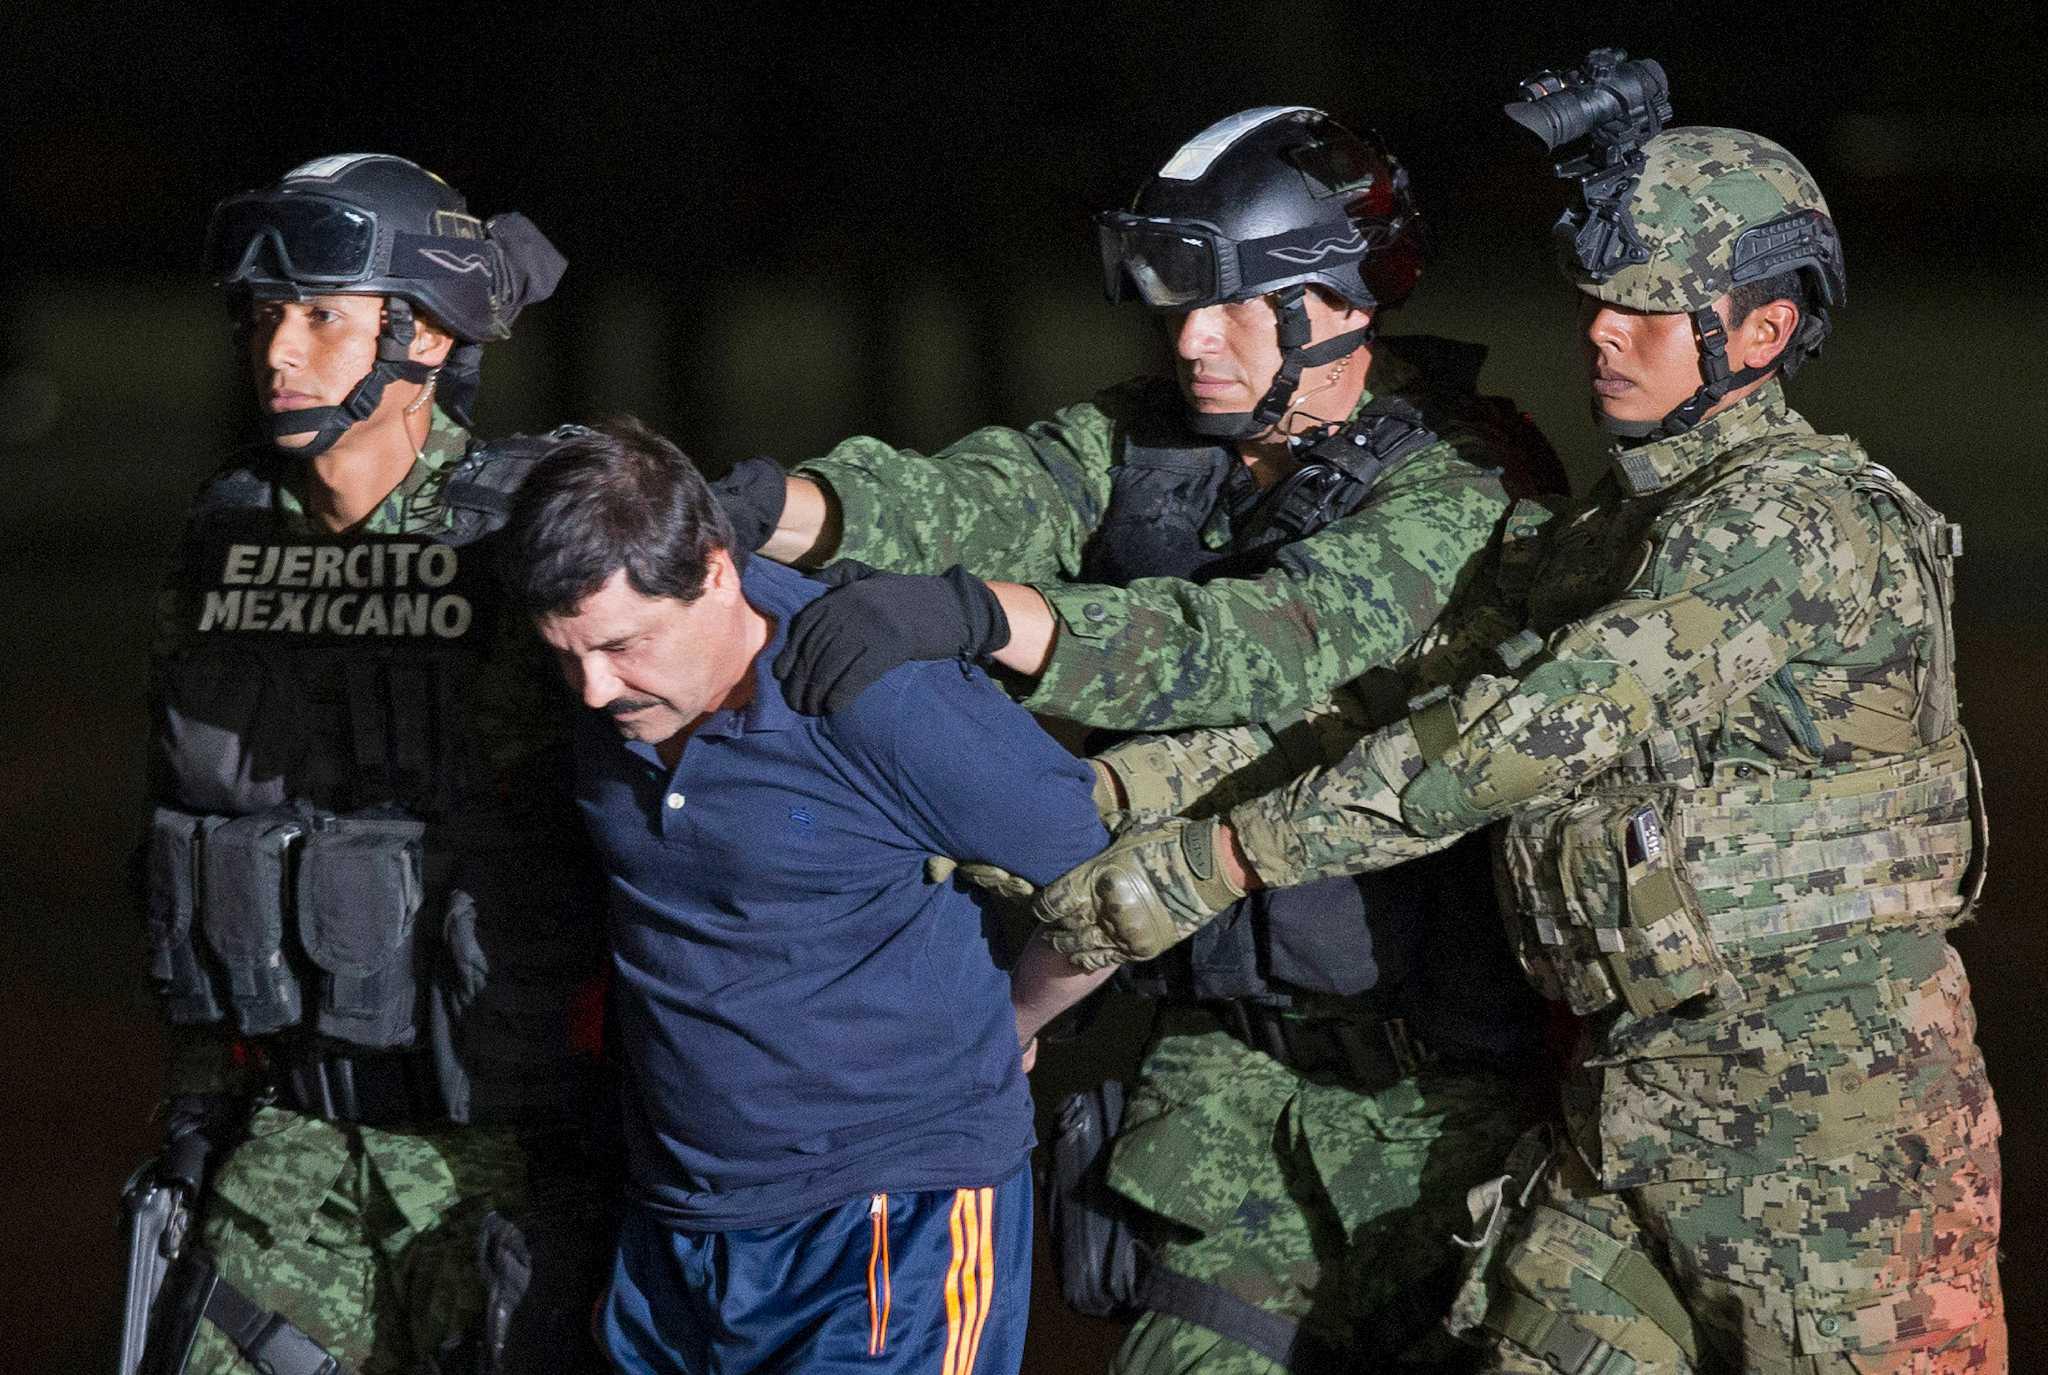 Judge presiding over 'El Chapo's' case shot, killed while jogging outside  home